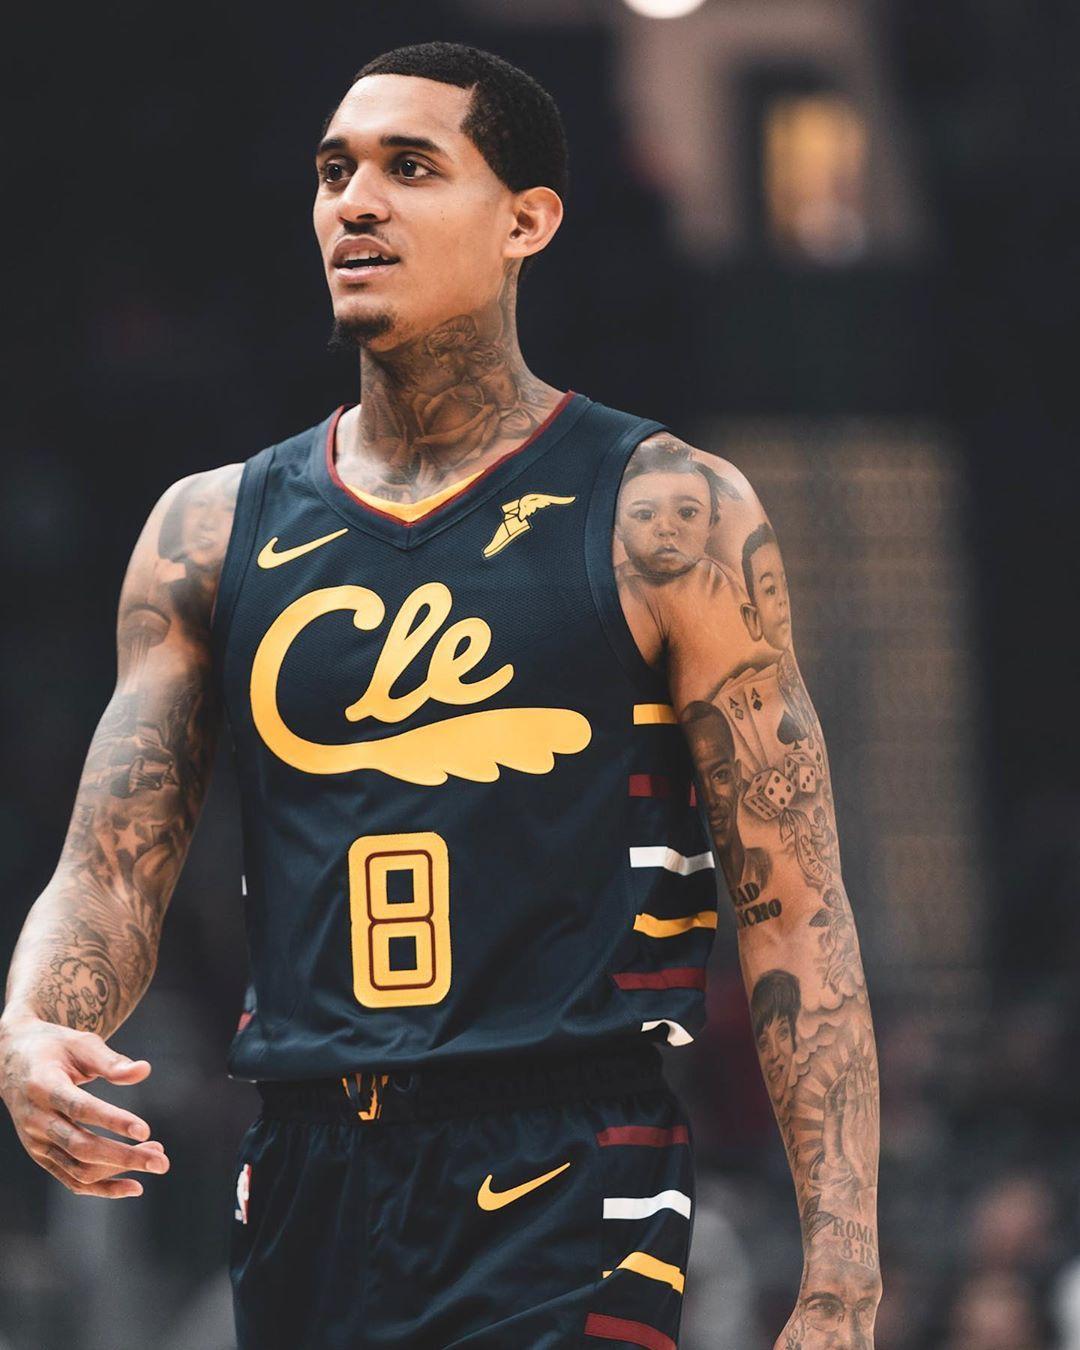 J On Instagram Know U Watching Big Bro Jordan Clarkson Basketball Players Christ Tattoo